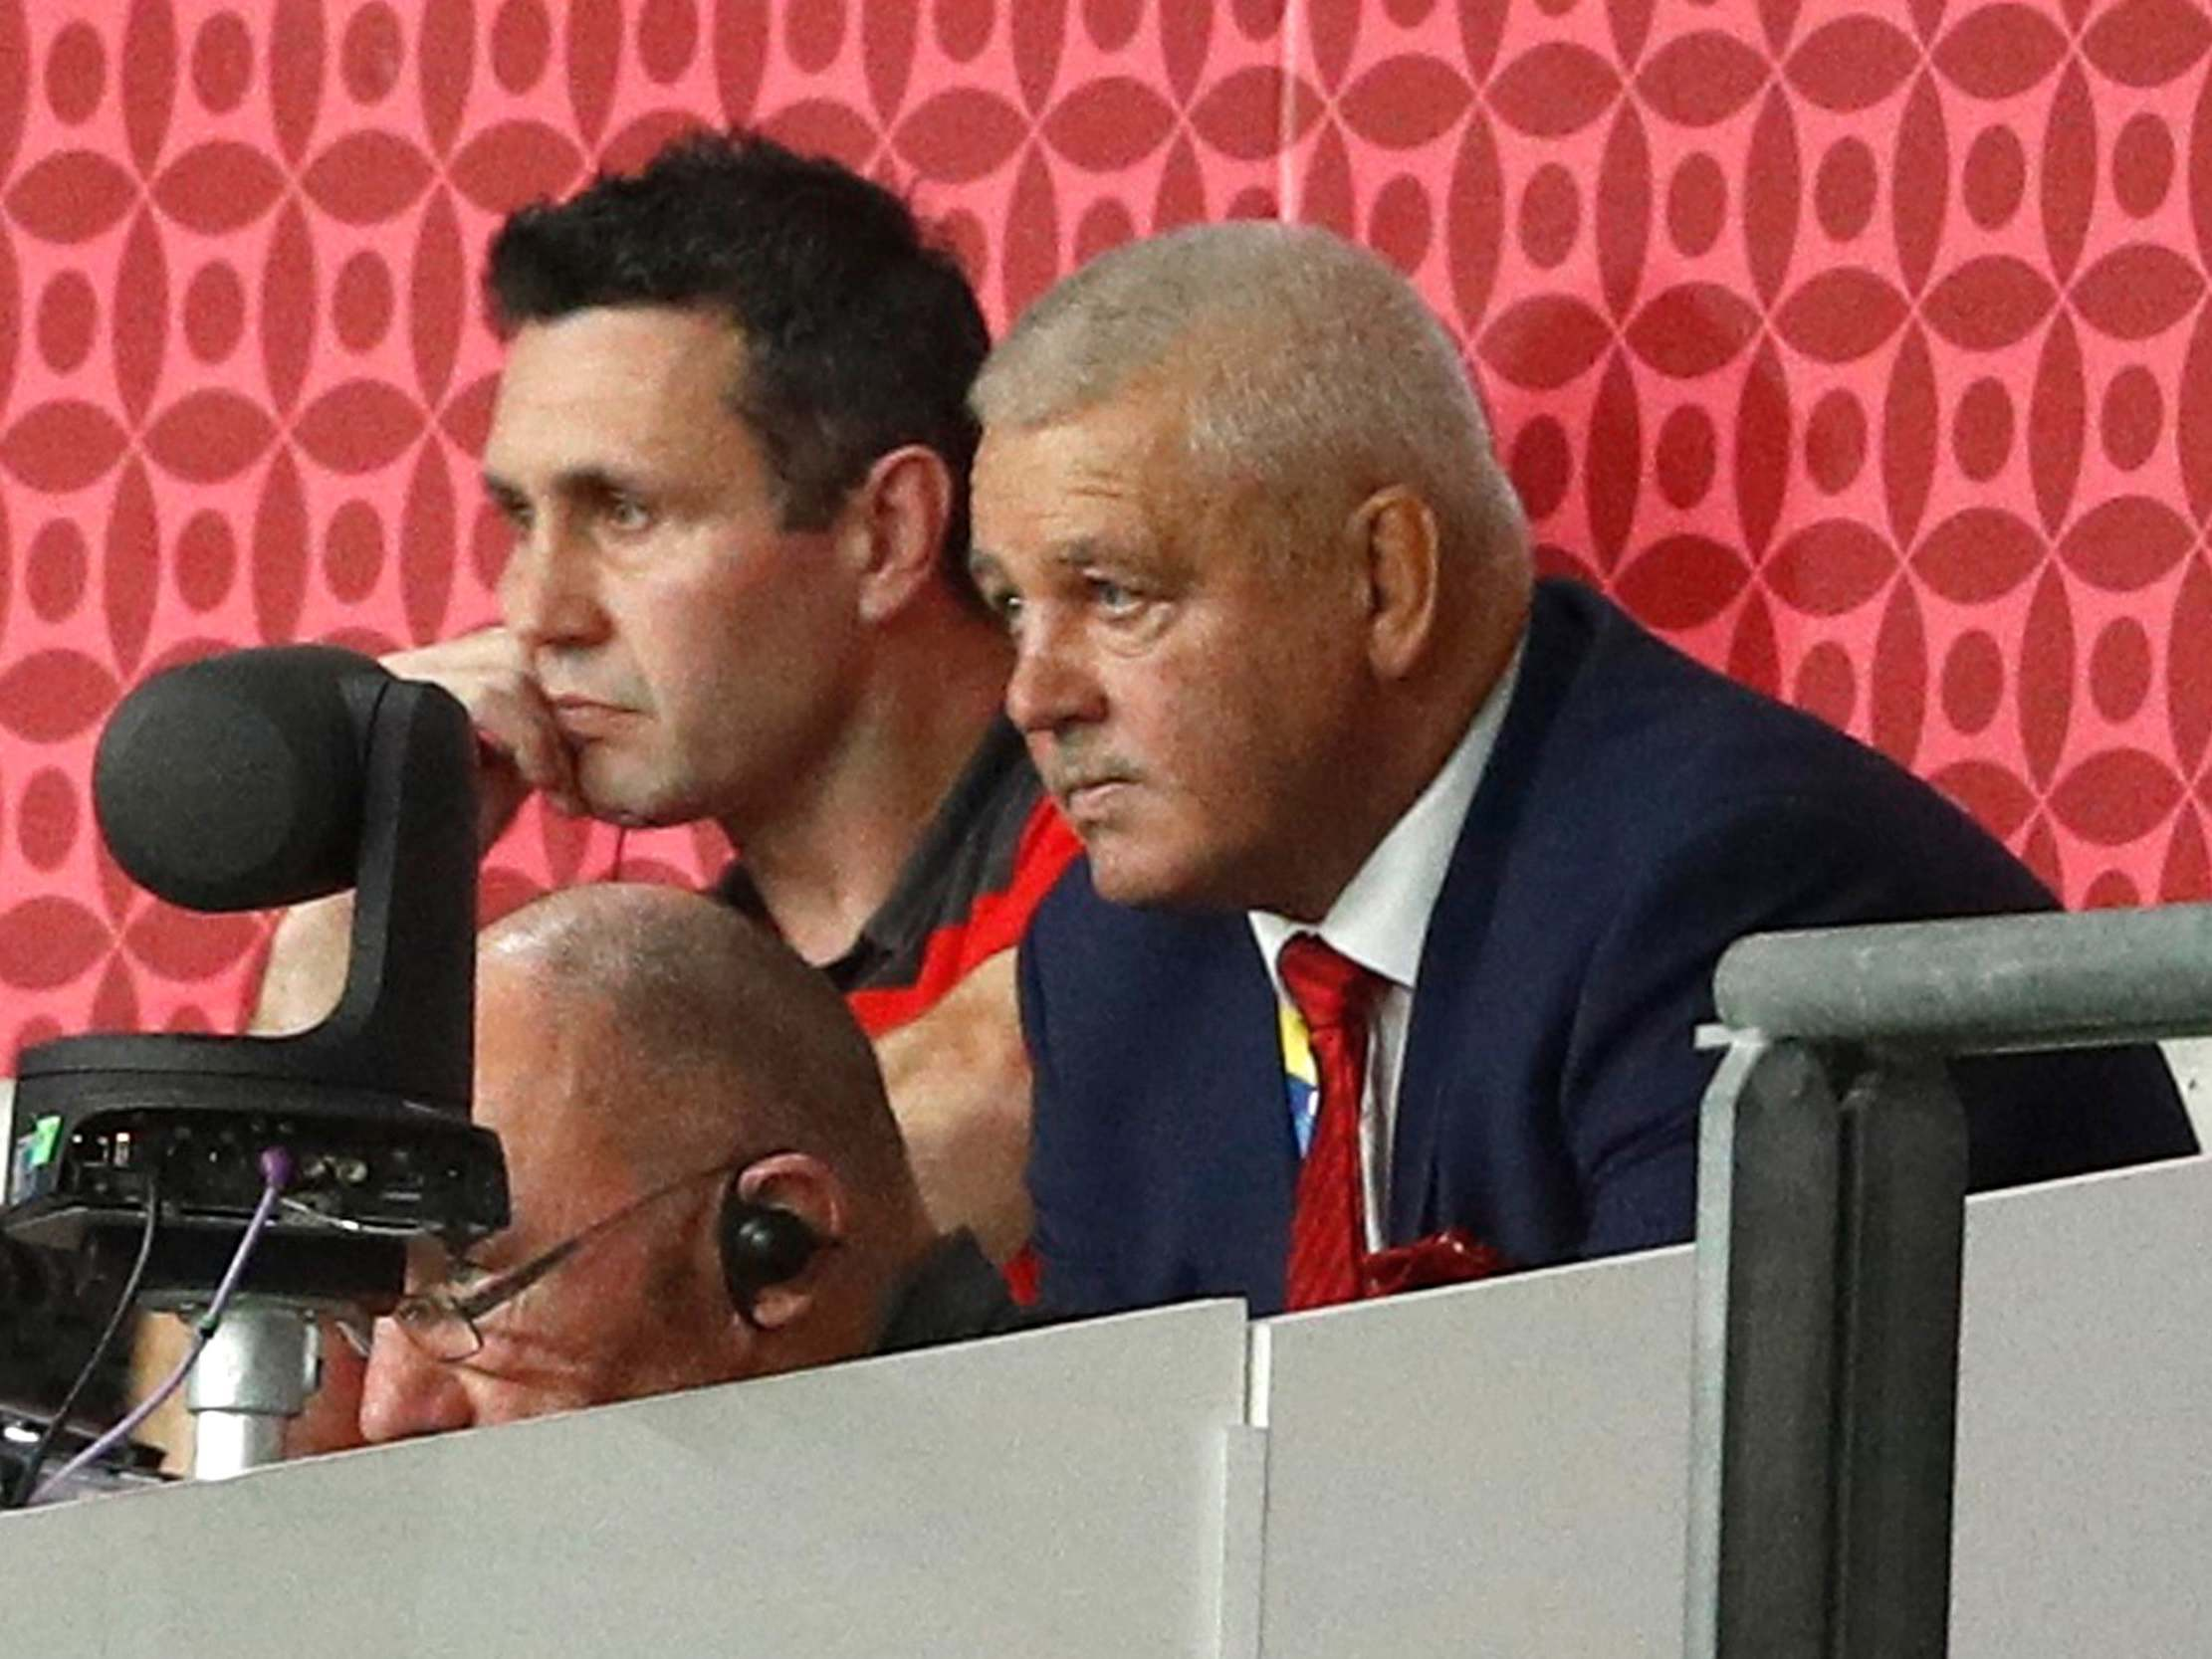 Rugby World Cup 2019: Warren Gatland was preparing Wales leaving speech before match-winning try